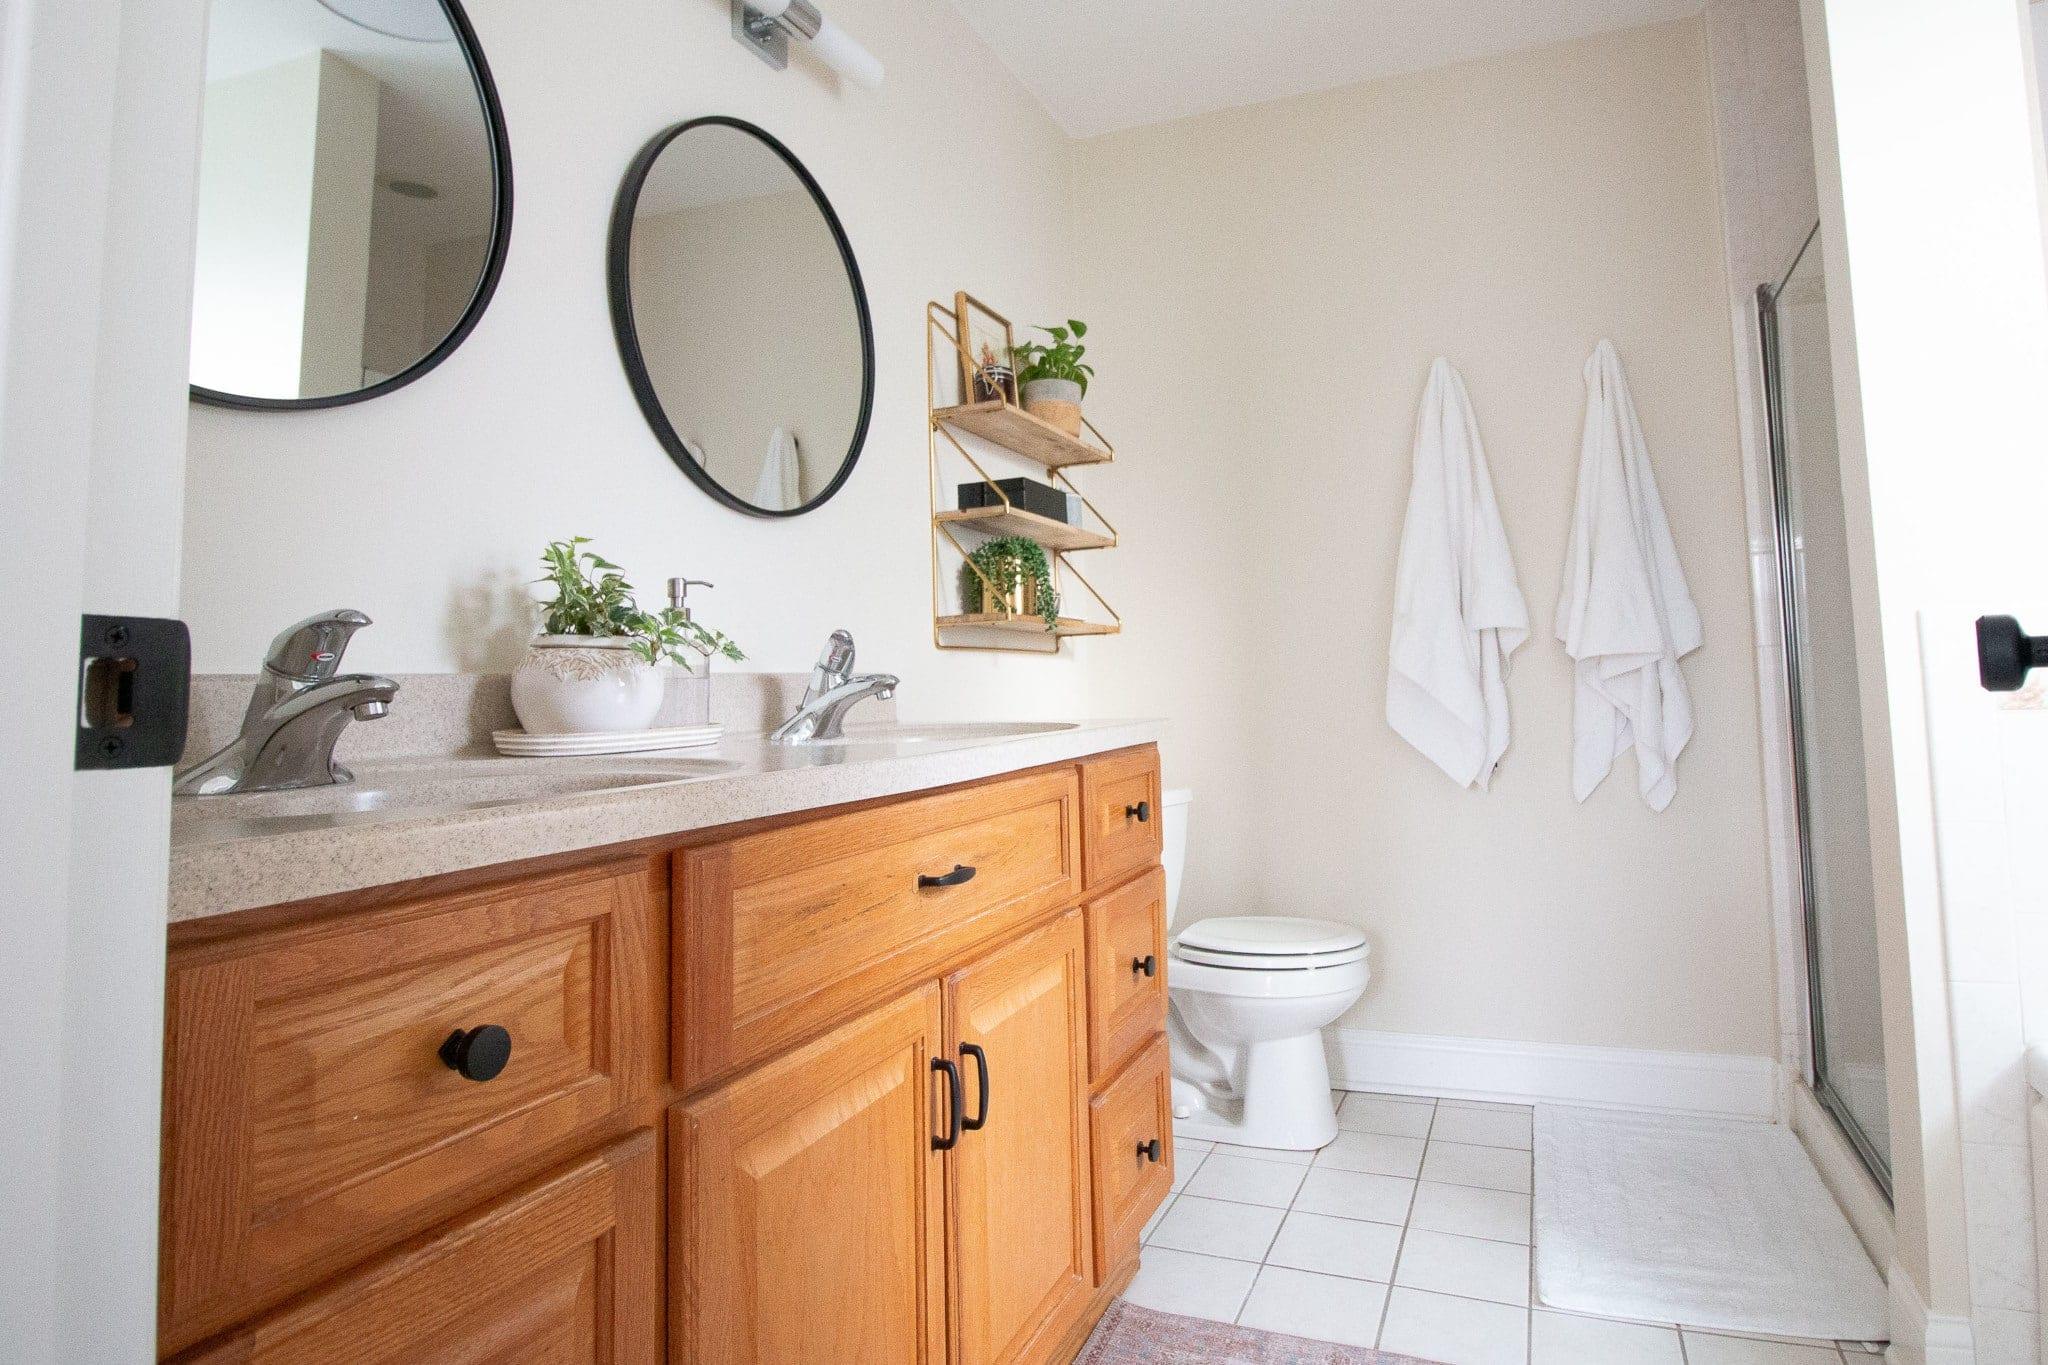 Our master bathroom